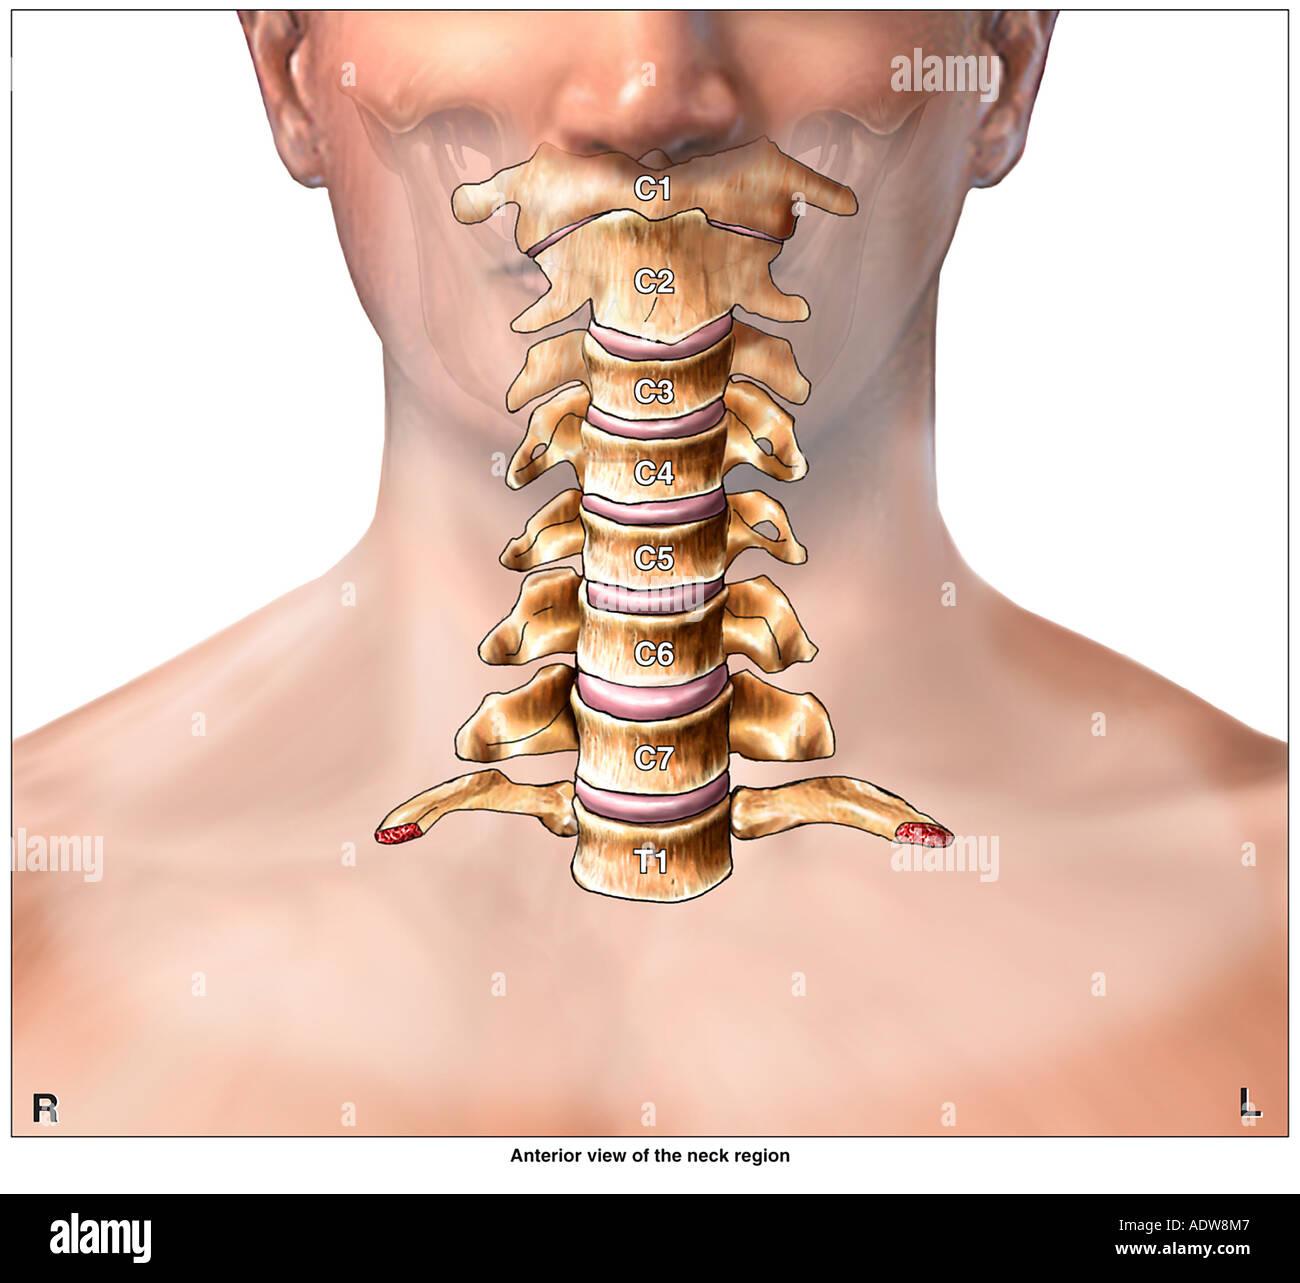 anatomy of the cervical spine region showing neck vertebrae stock, Human Body